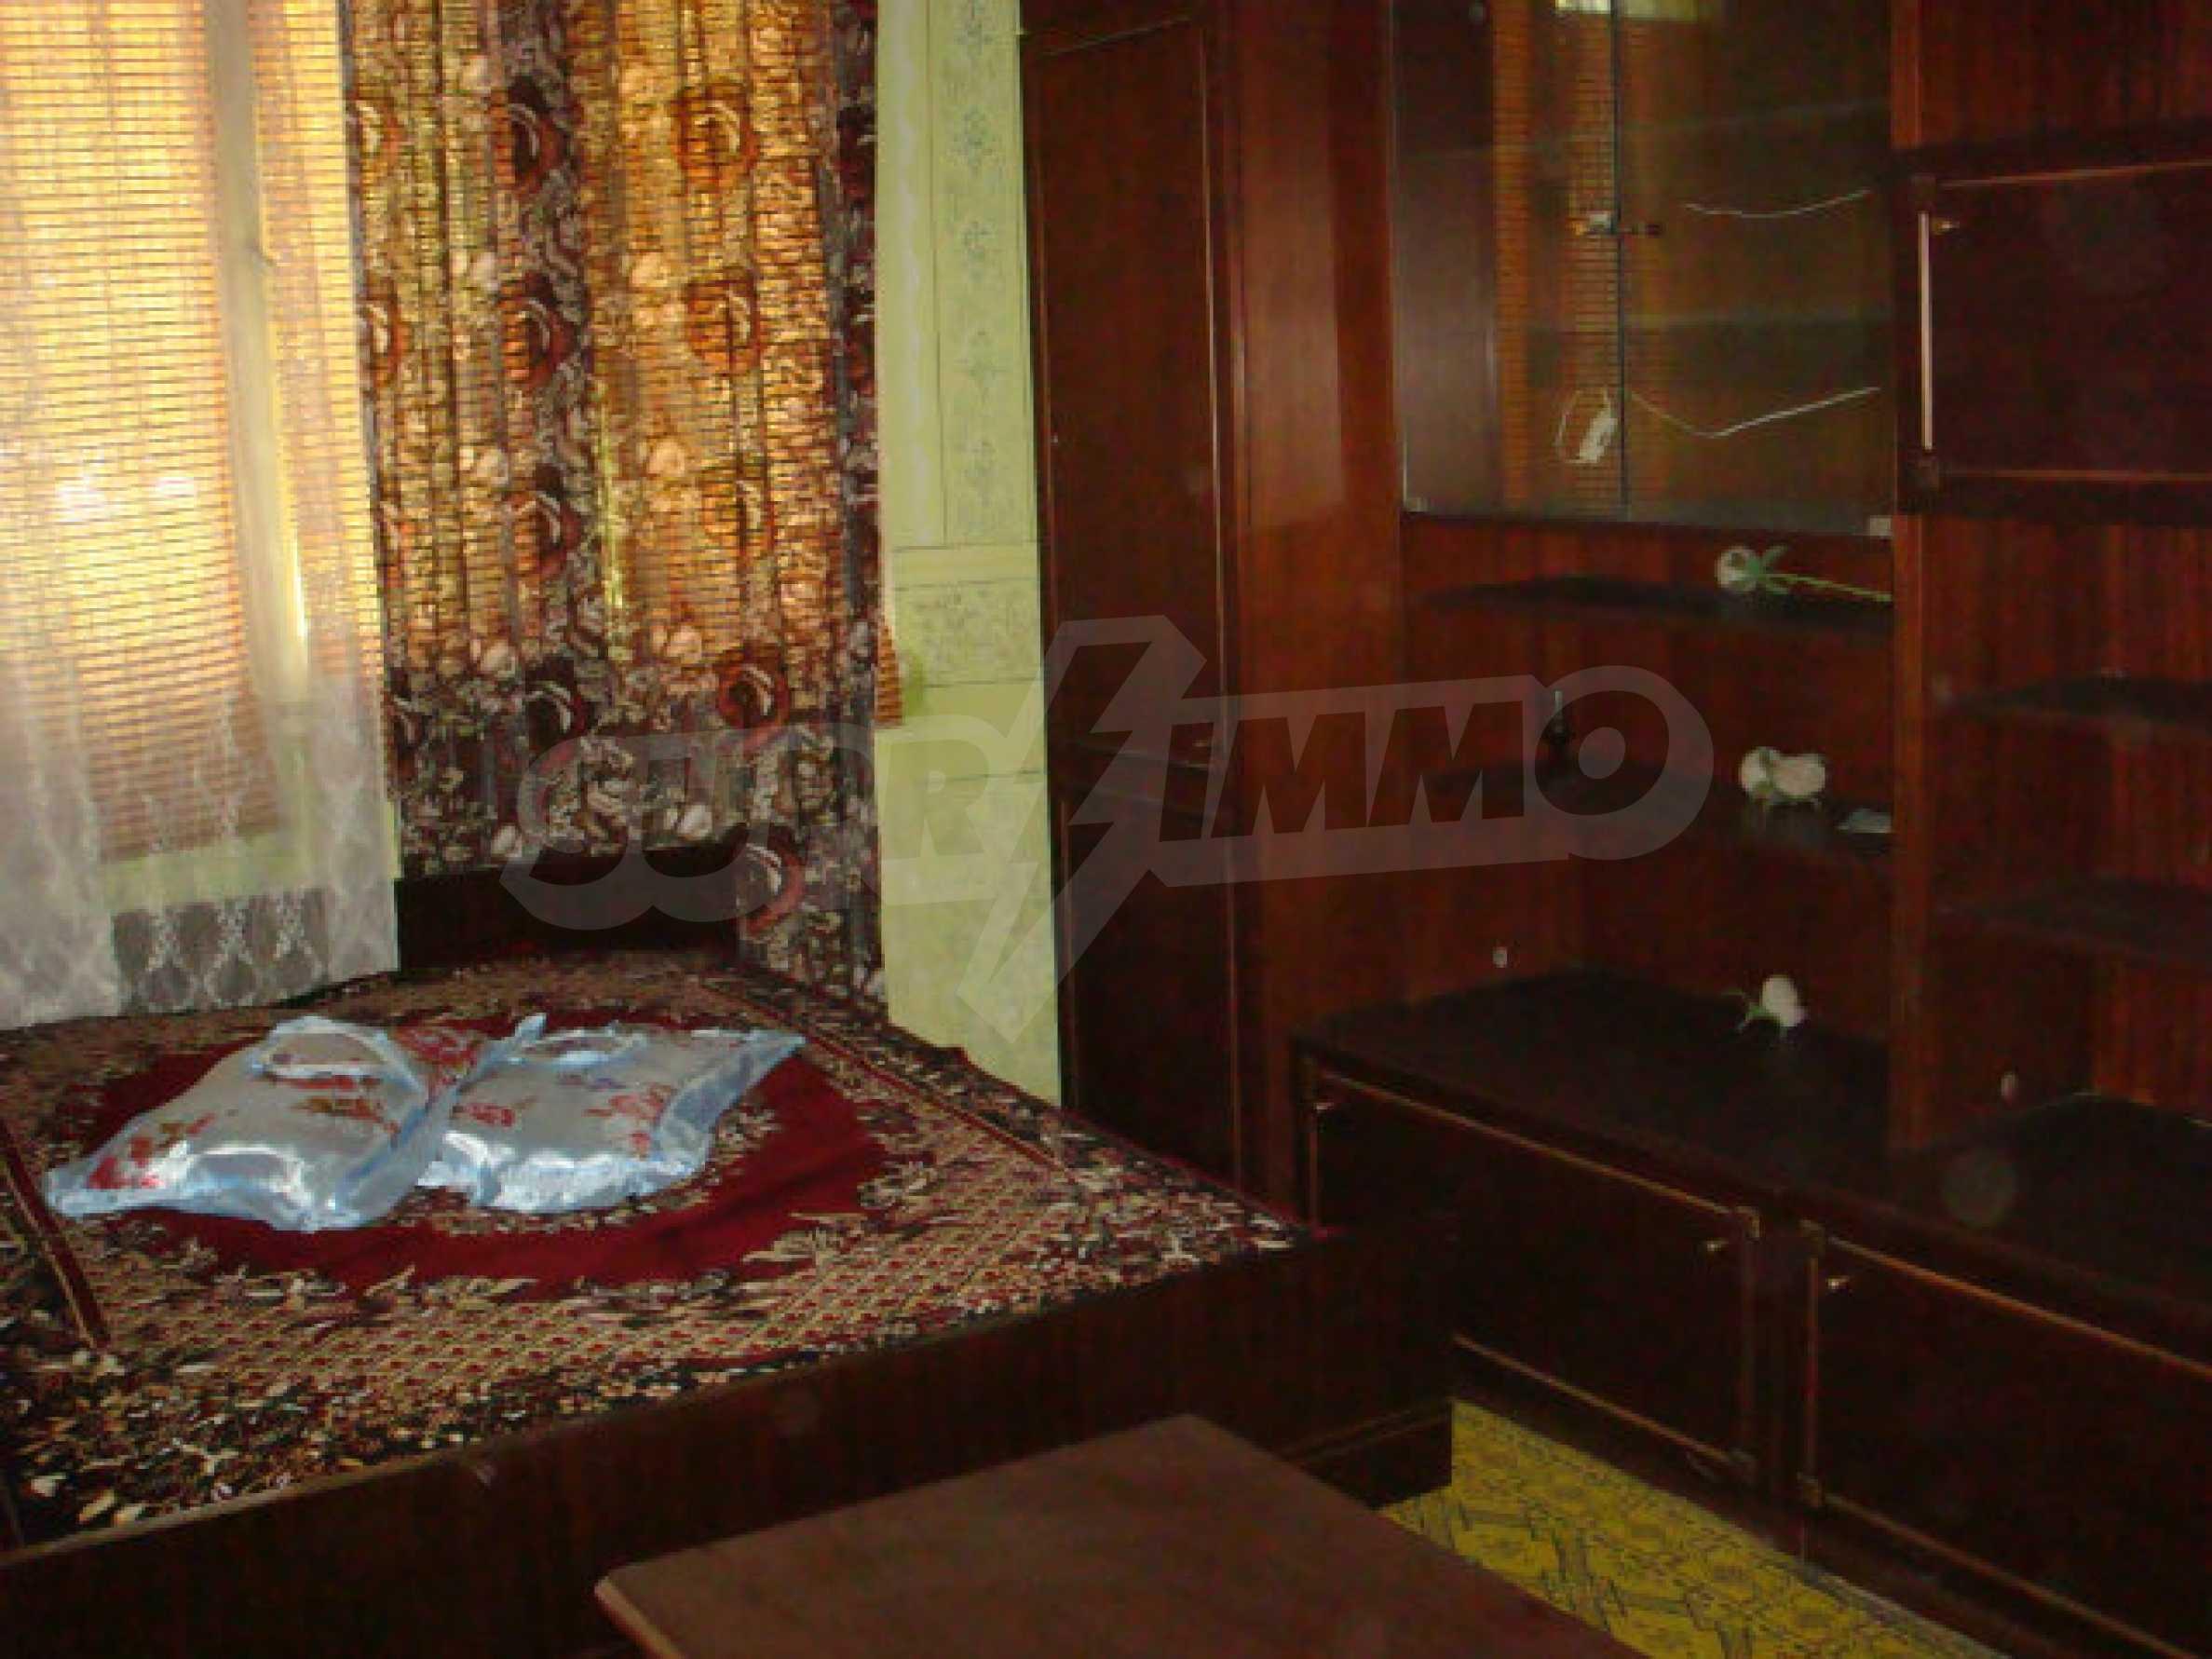 House for sale in village near Vidin 6